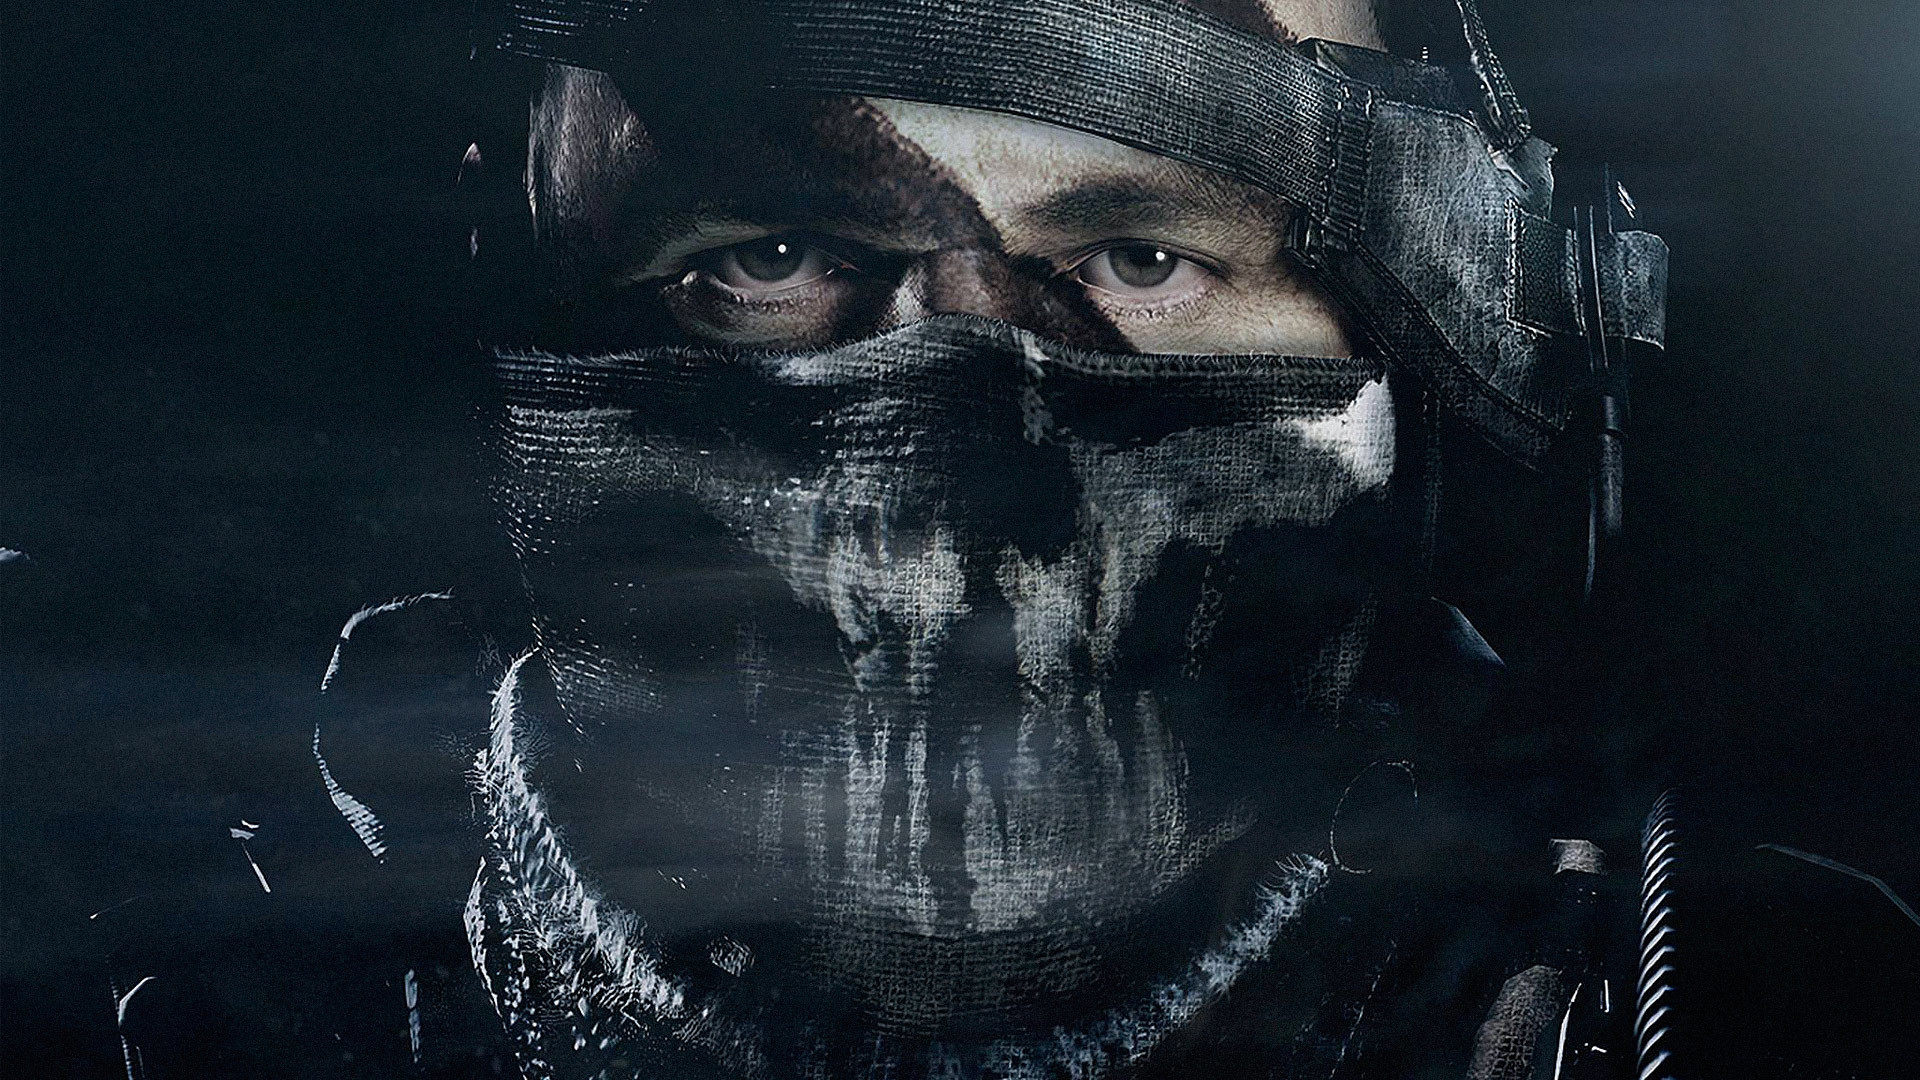 HD Hintergrundbilder Call Of Duty Ghosts Maske Gesicht